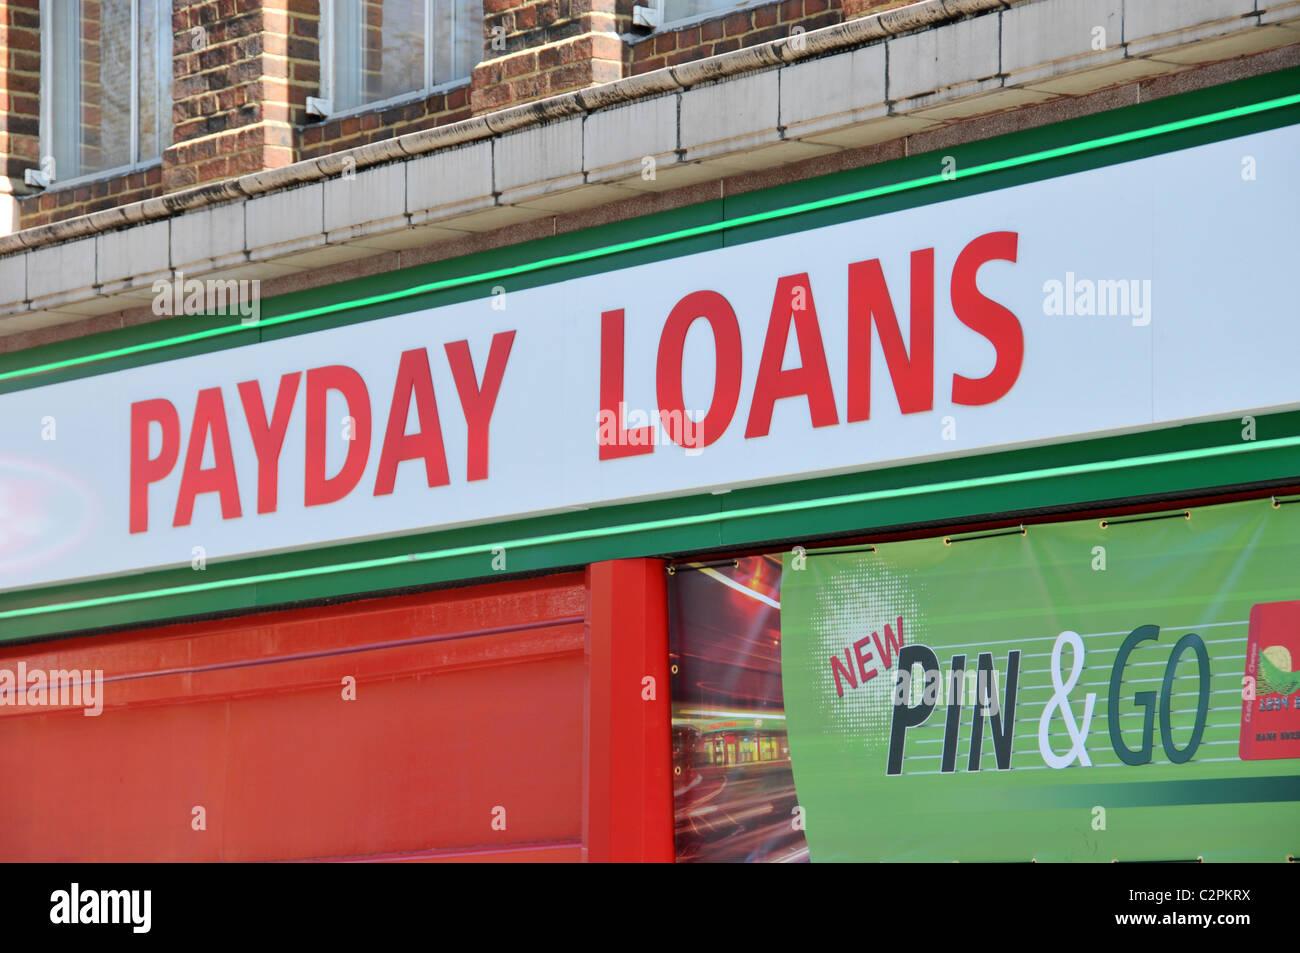 Payday Loans company Brixton speedy cash debt poor money management - Stock Image